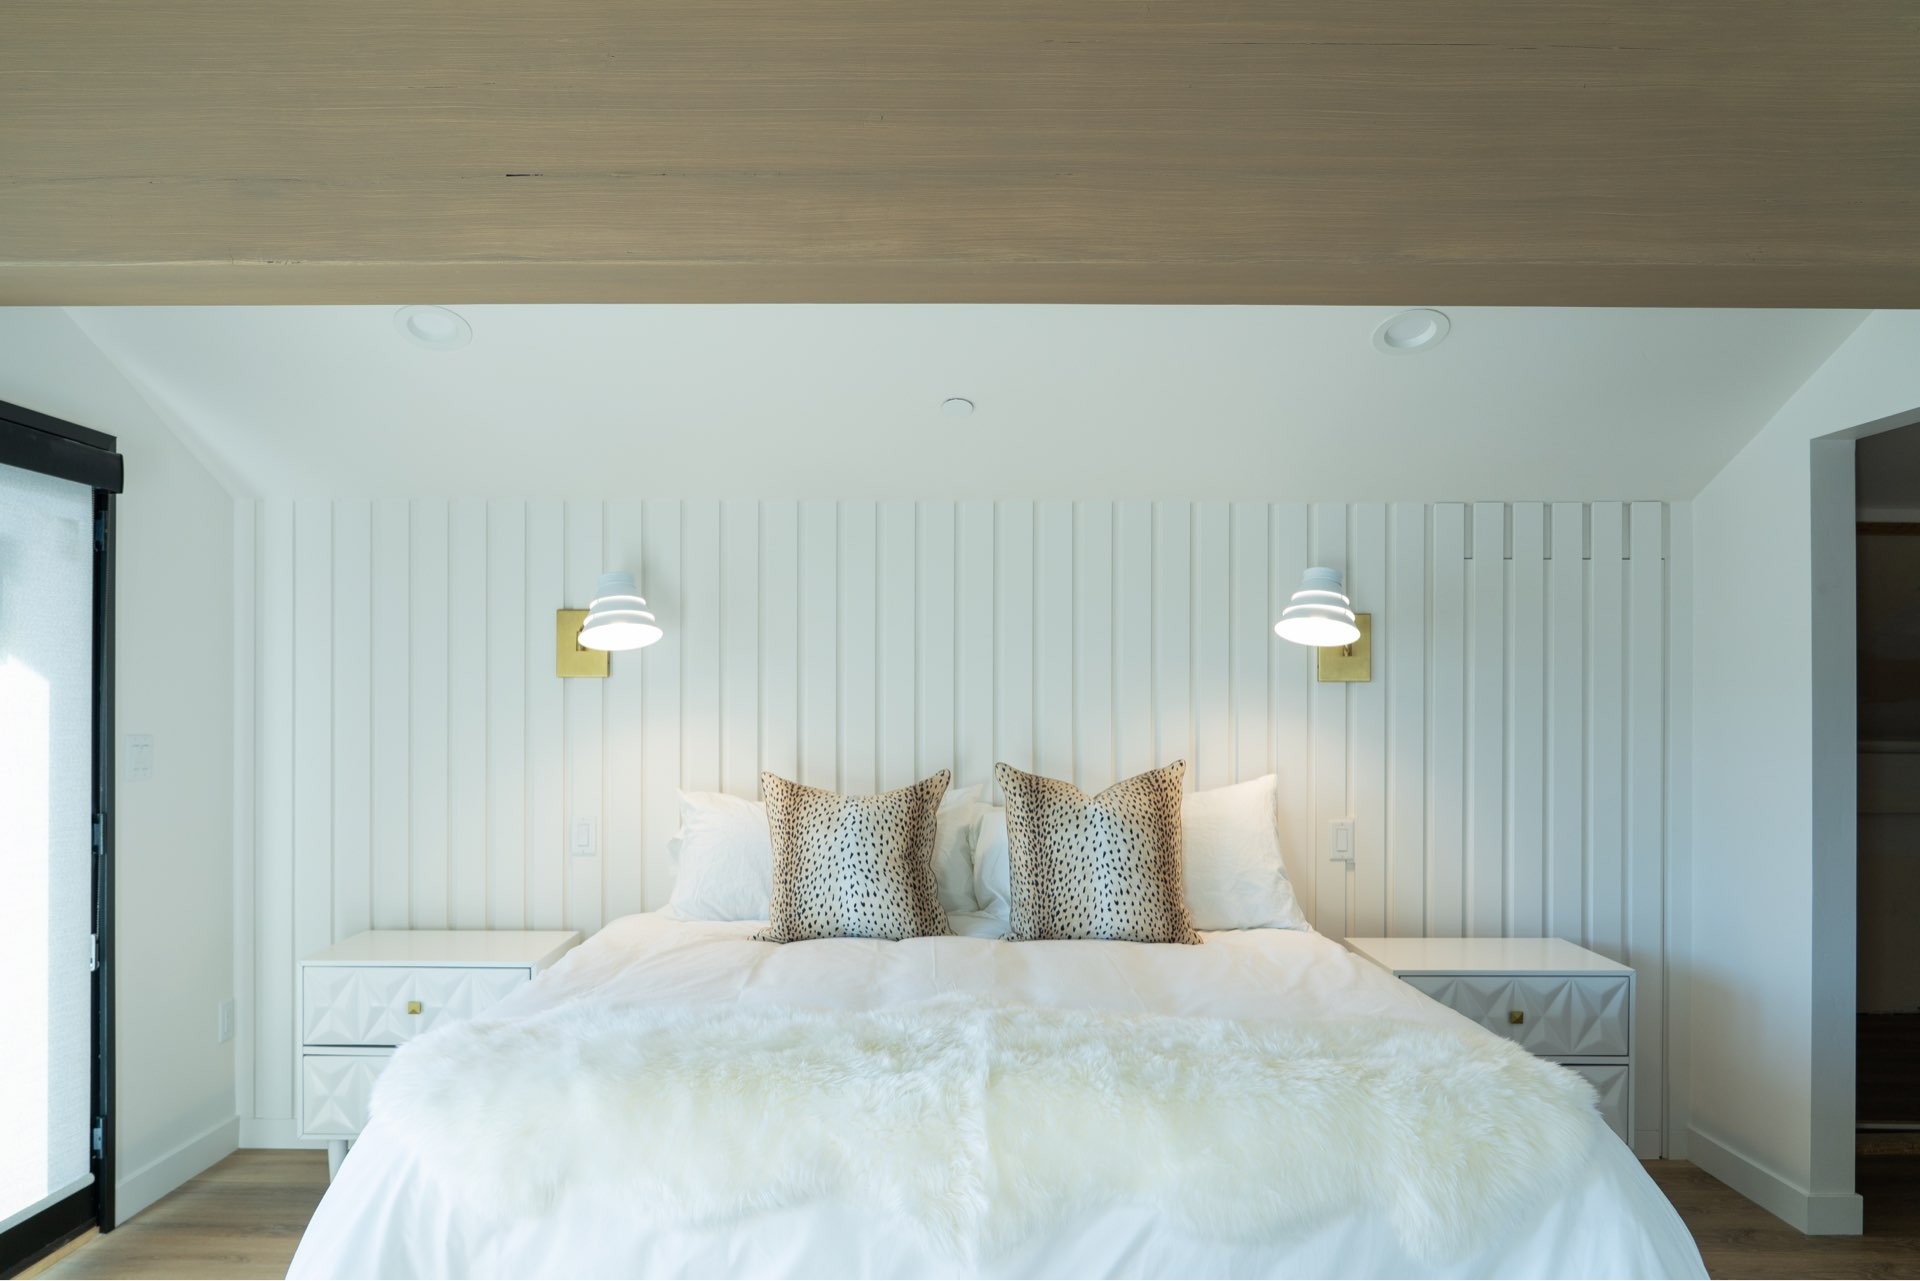 Bedroom, Larkspur Residence, architectural design by Elliott Workgroup